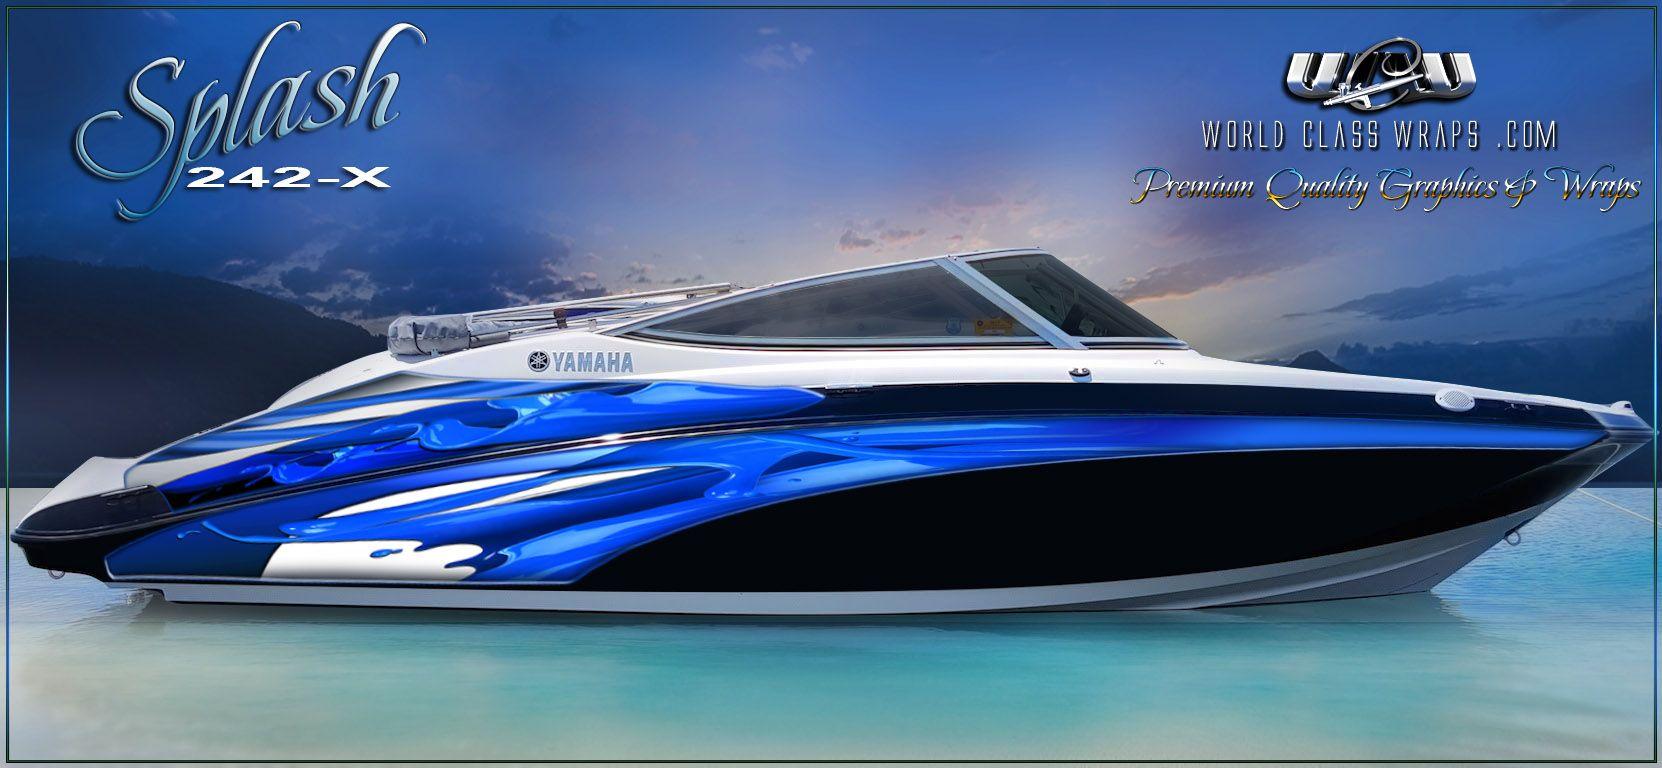 Image Result For Boat Graphics Wraps Boat Boat Wraps Pontoon Boat